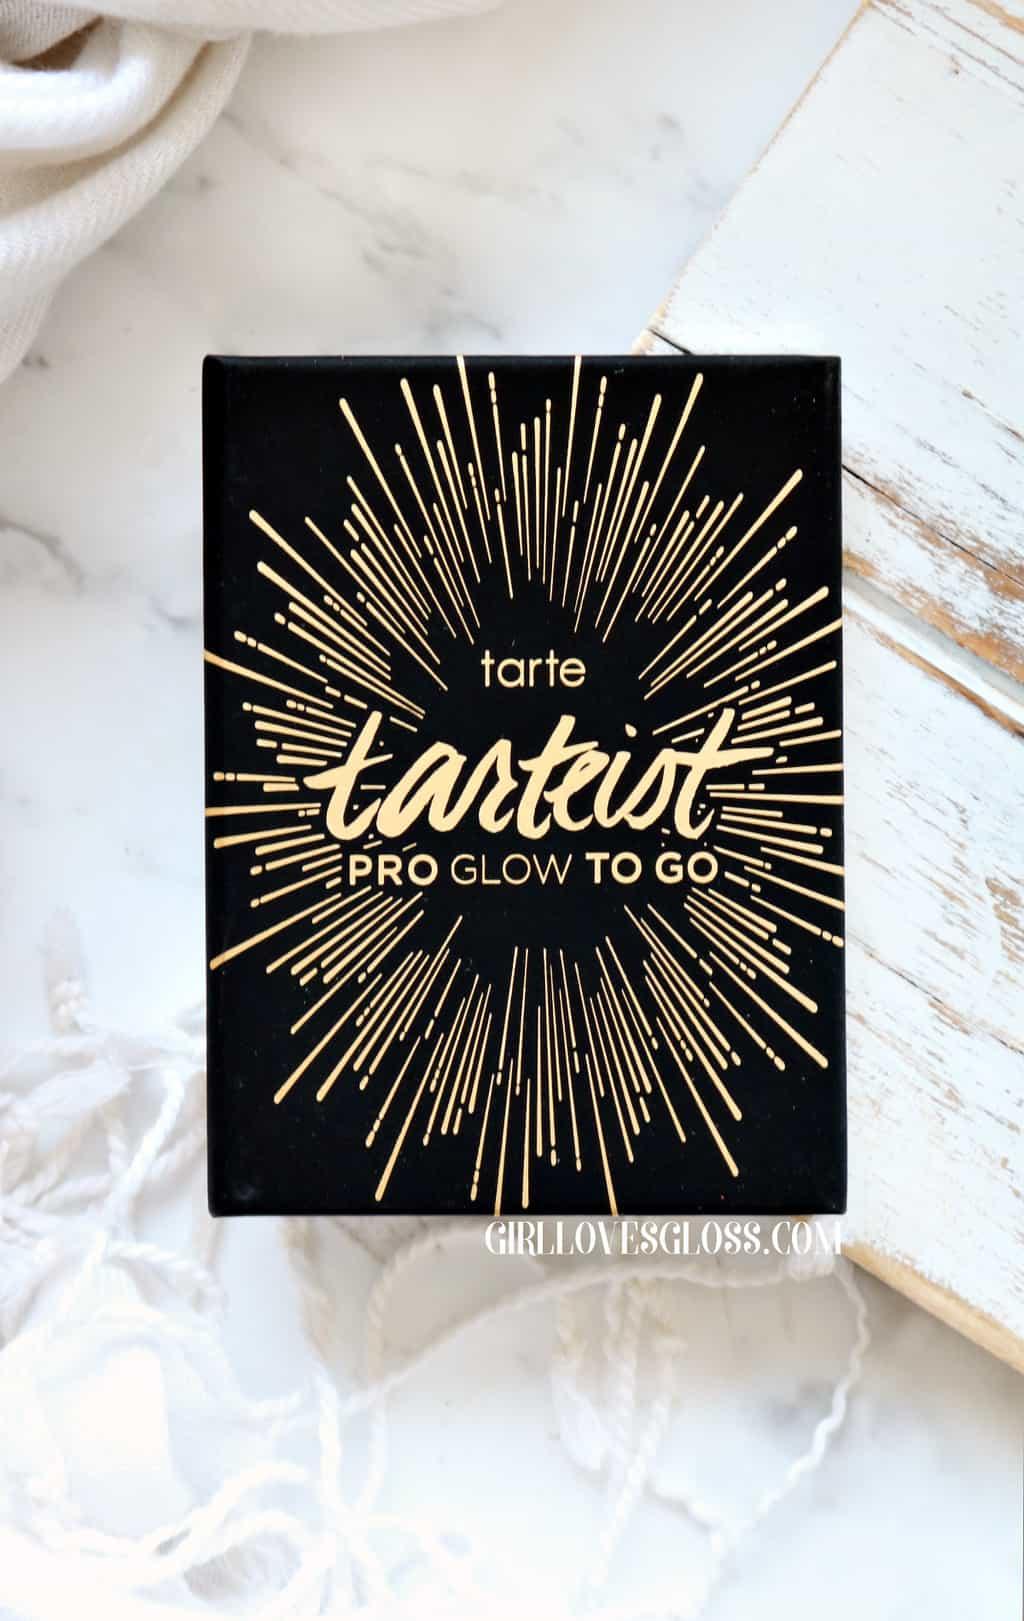 Tarte Pro Glow to Go Palette